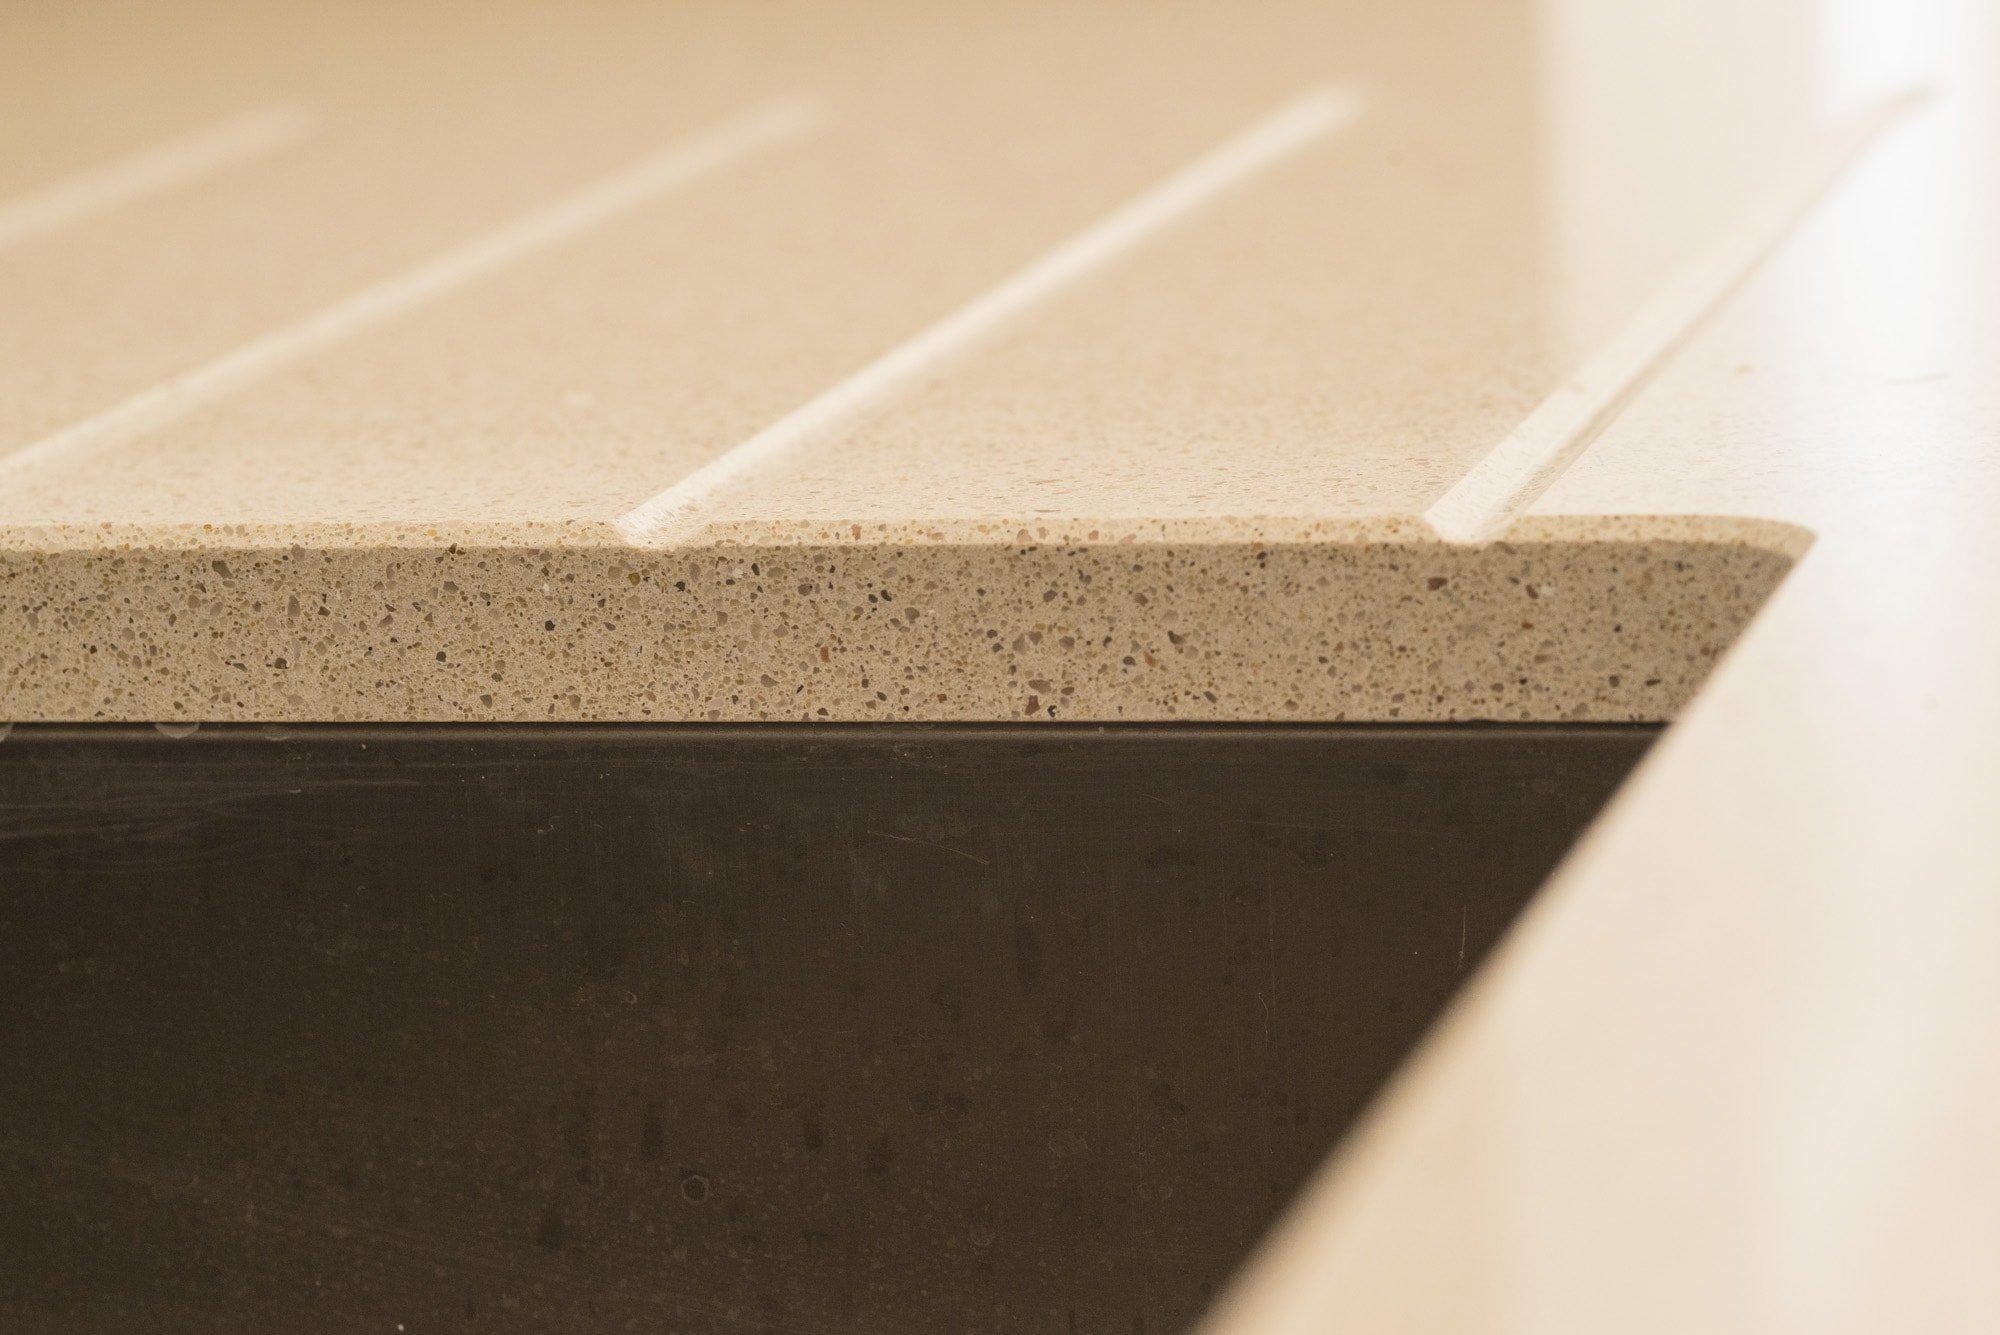 silestone_blanco_city_20mm_ashford_middlesex_133019_a_sink_cutout_drainage_grooves-min